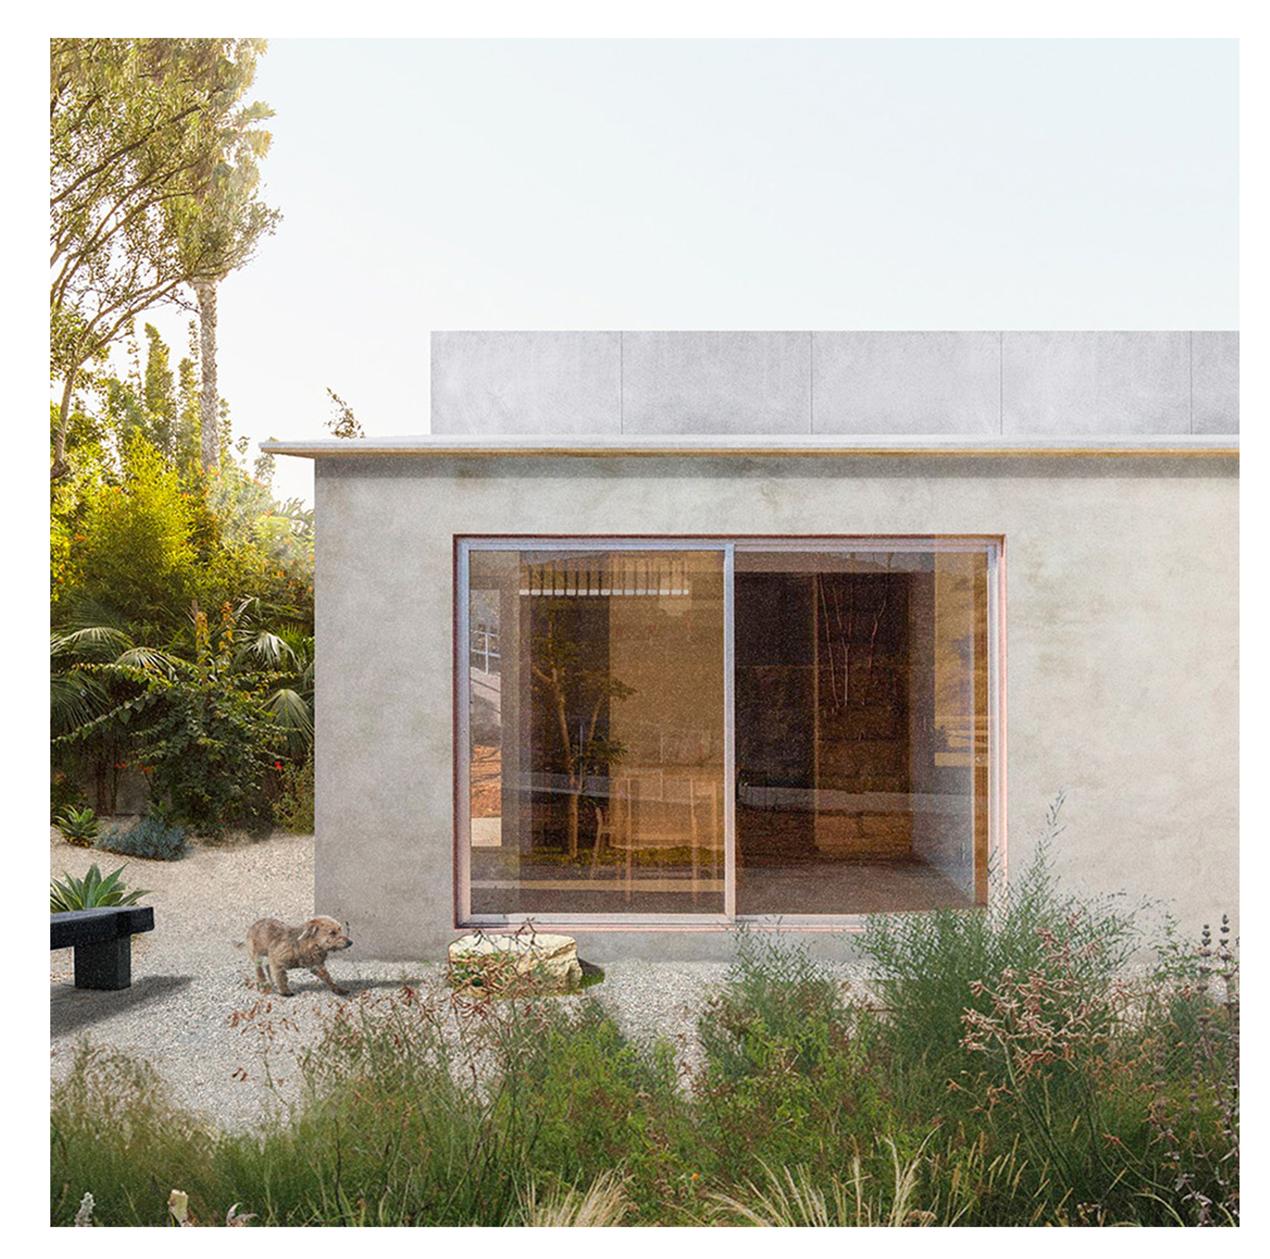 I photo of a backyard home, duplex, or ADU